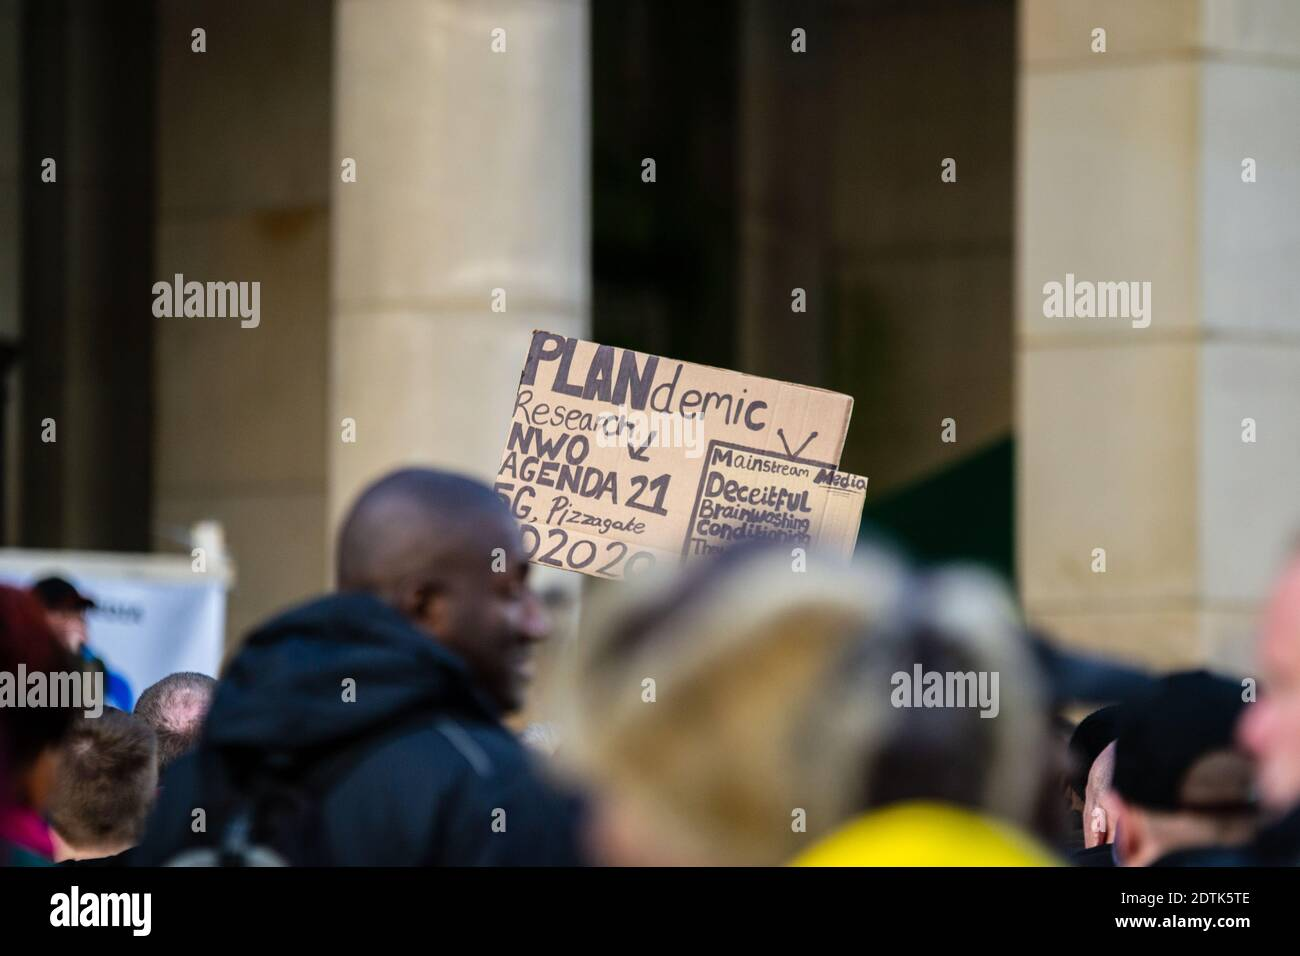 anti-maskers-and-anti-lockdown-protesters-in-birmingham-uk-in-october-2020-plandemic-2DTK5TE.jpg